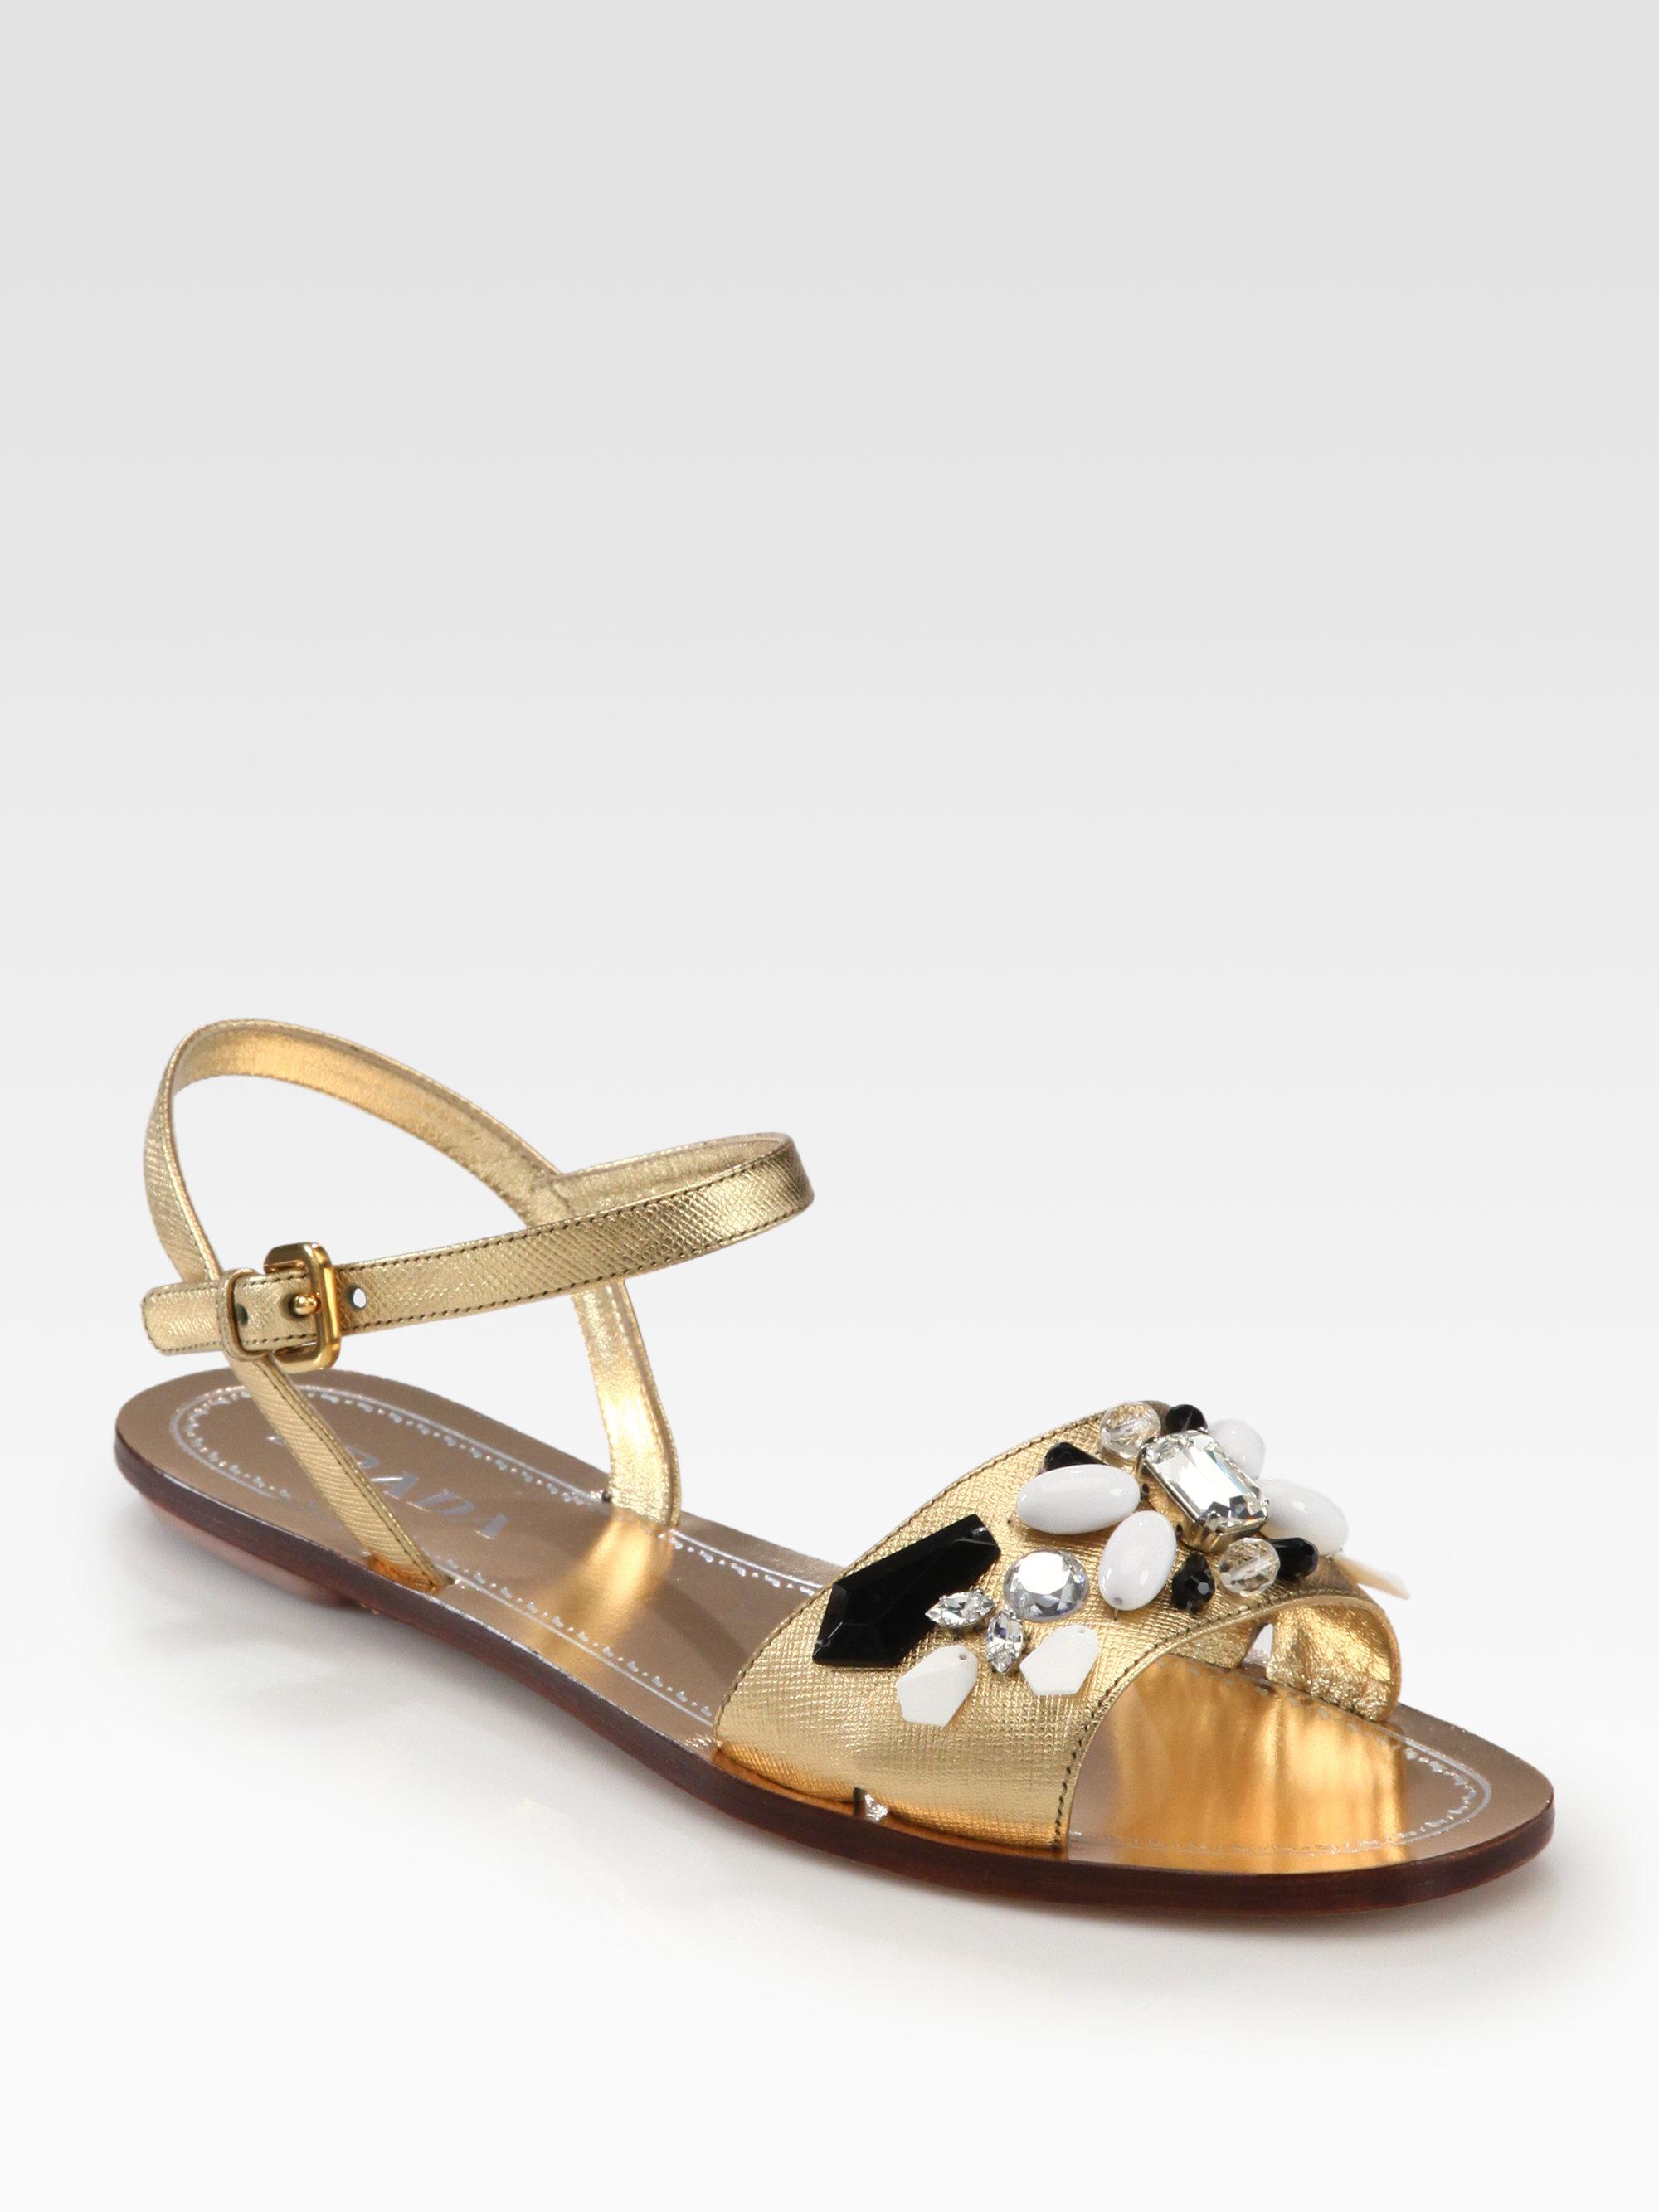 Prada Jeweled Saffiano Metallic Leather Sandals In Gold